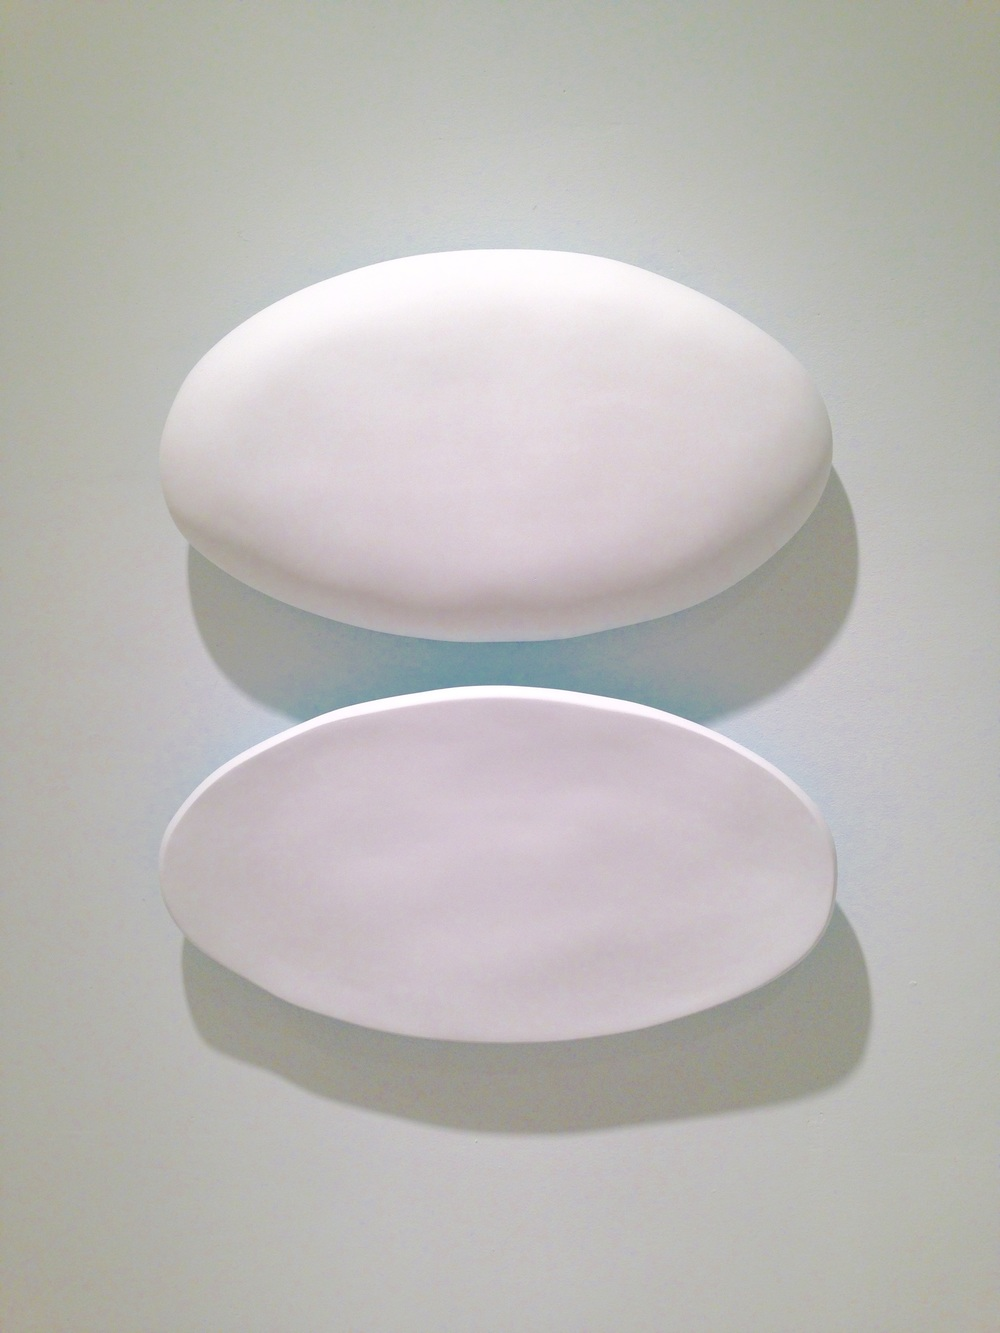 Untitled diptych fiberglass, hydrostone, paint 21 x 21 x 4 in 2014